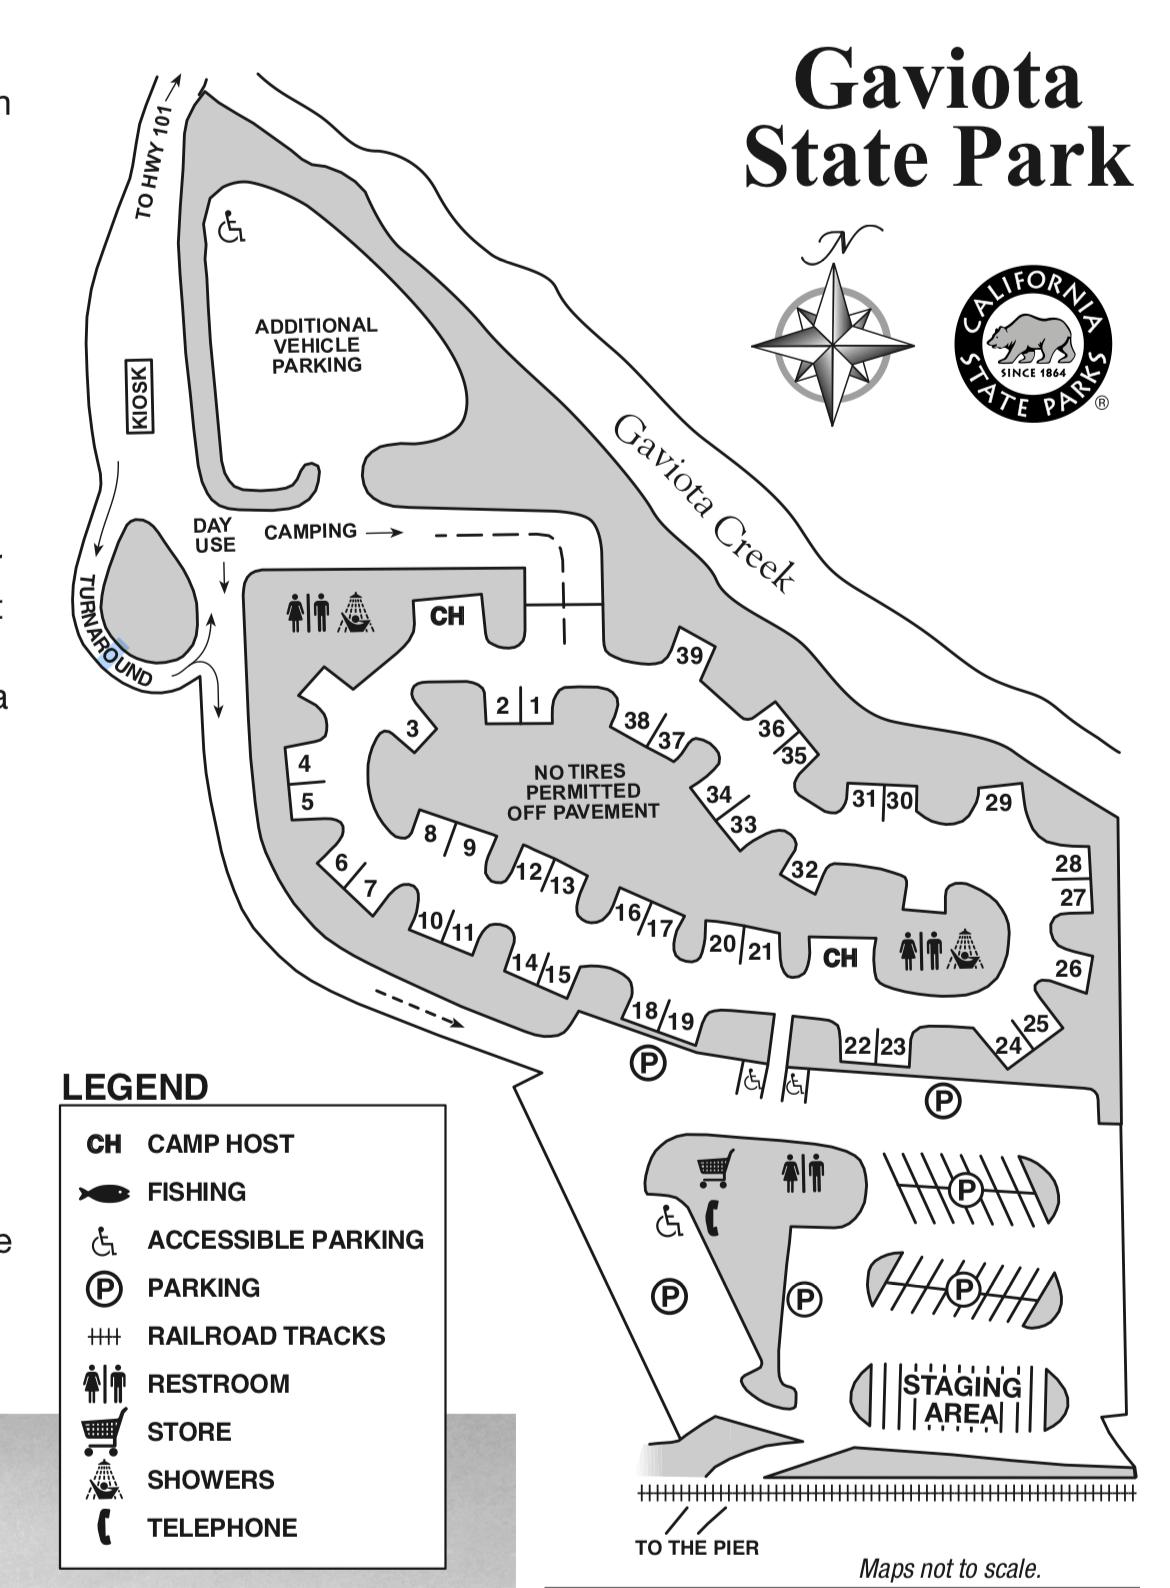 Gaviota State Park Campsite Photos Camping Info